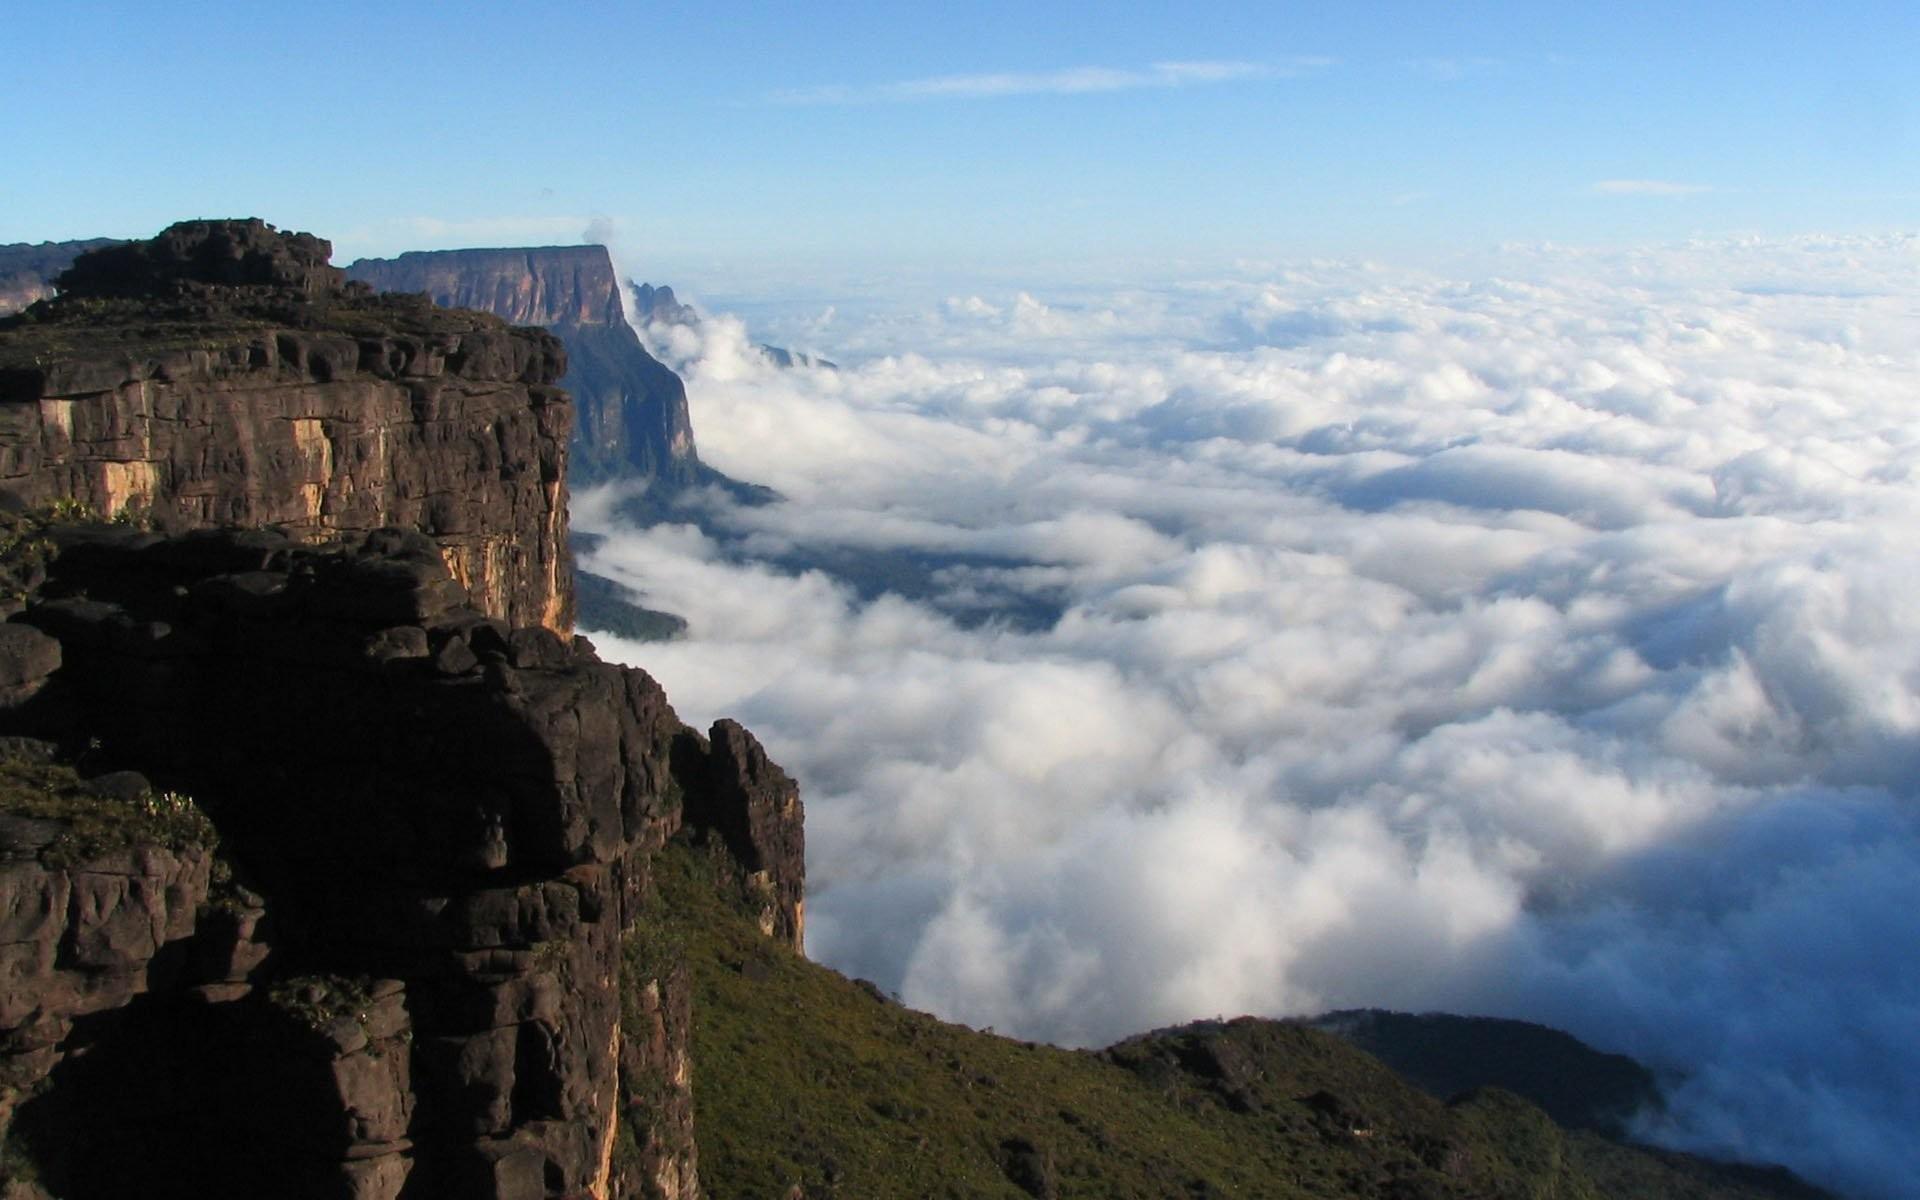 Angel Falls, Venezuela, Waterfall, Mountain, Cliff, - Venezuela Mountains , HD Wallpaper & Backgrounds